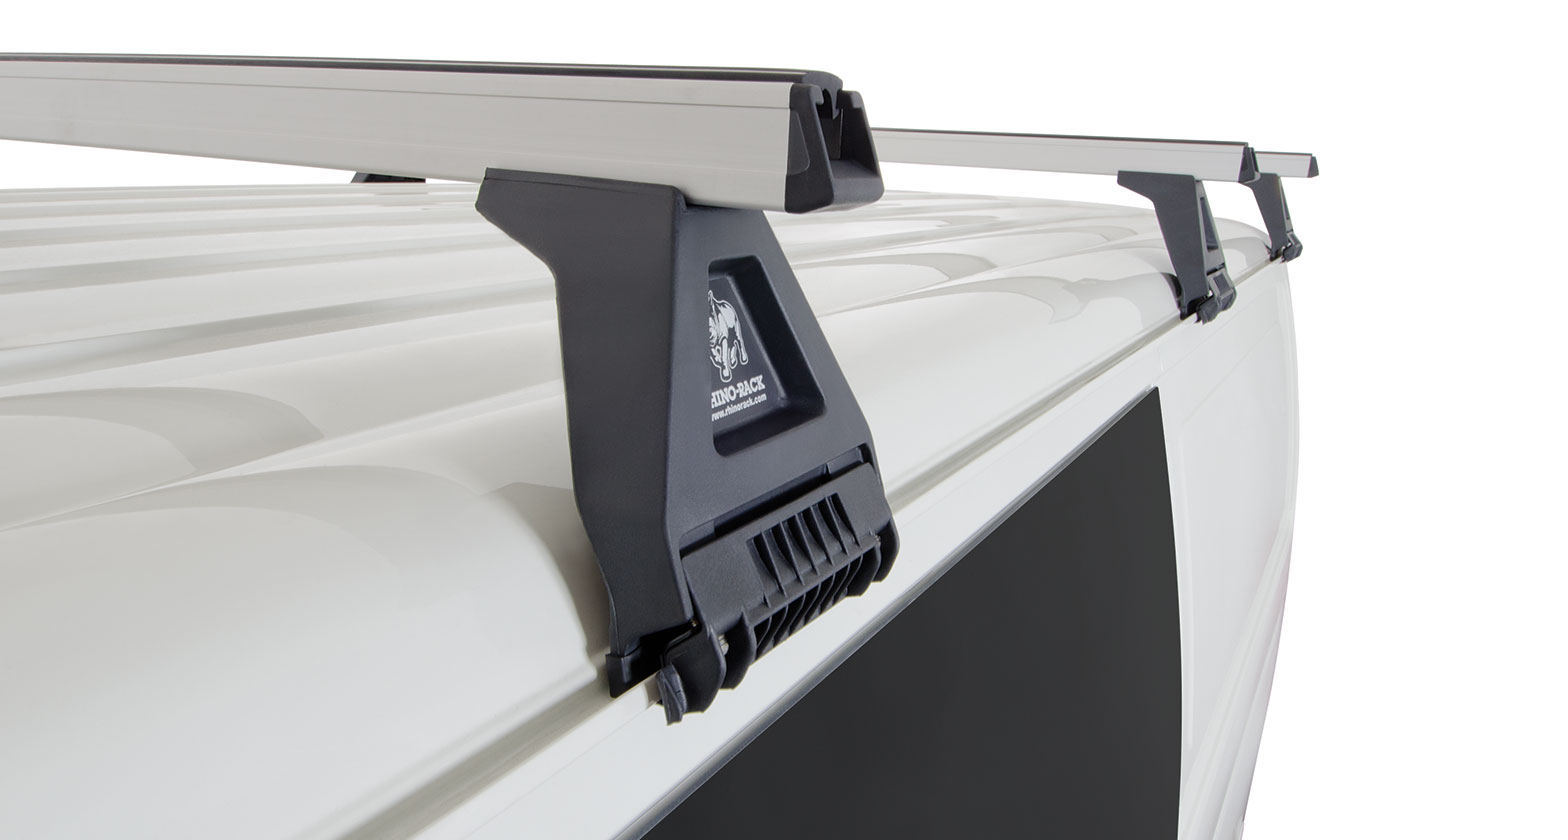 Ja0902 Heavy Duty Rl150 Silver 3 Bar Roof Rack Rhino Rack